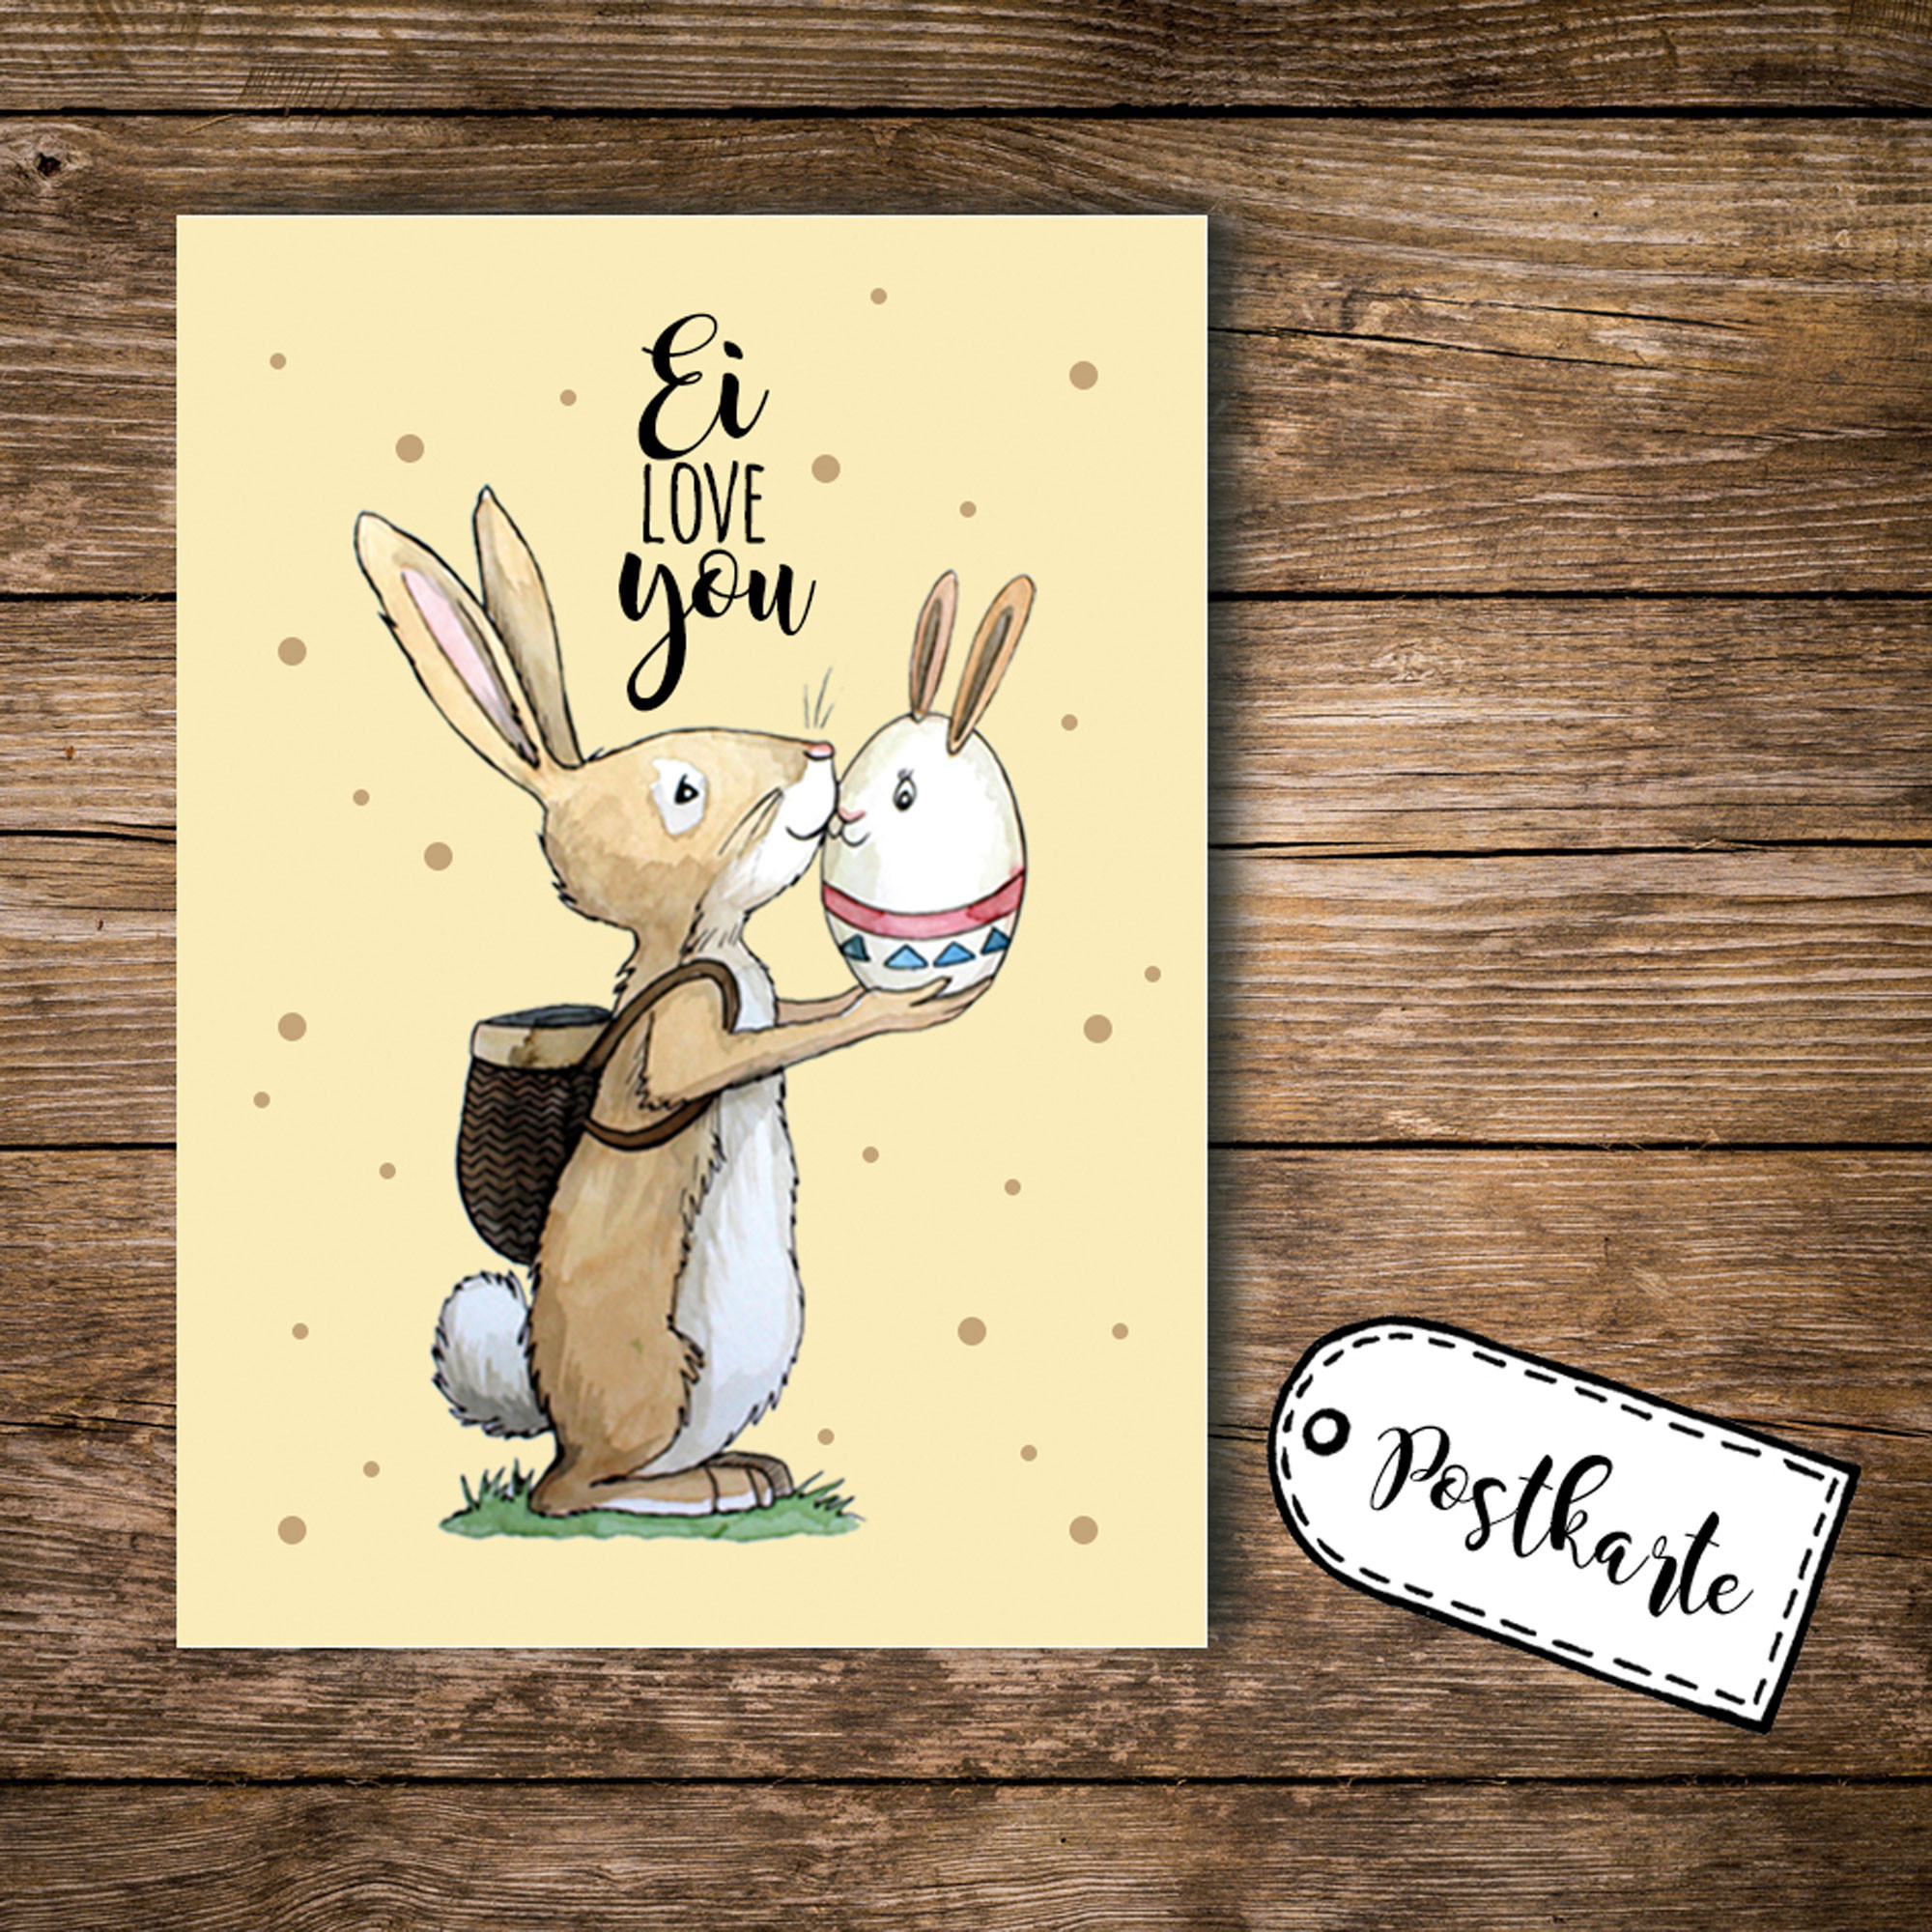 a6 postkarte osterkarte print hase osterhase mit spruch ei